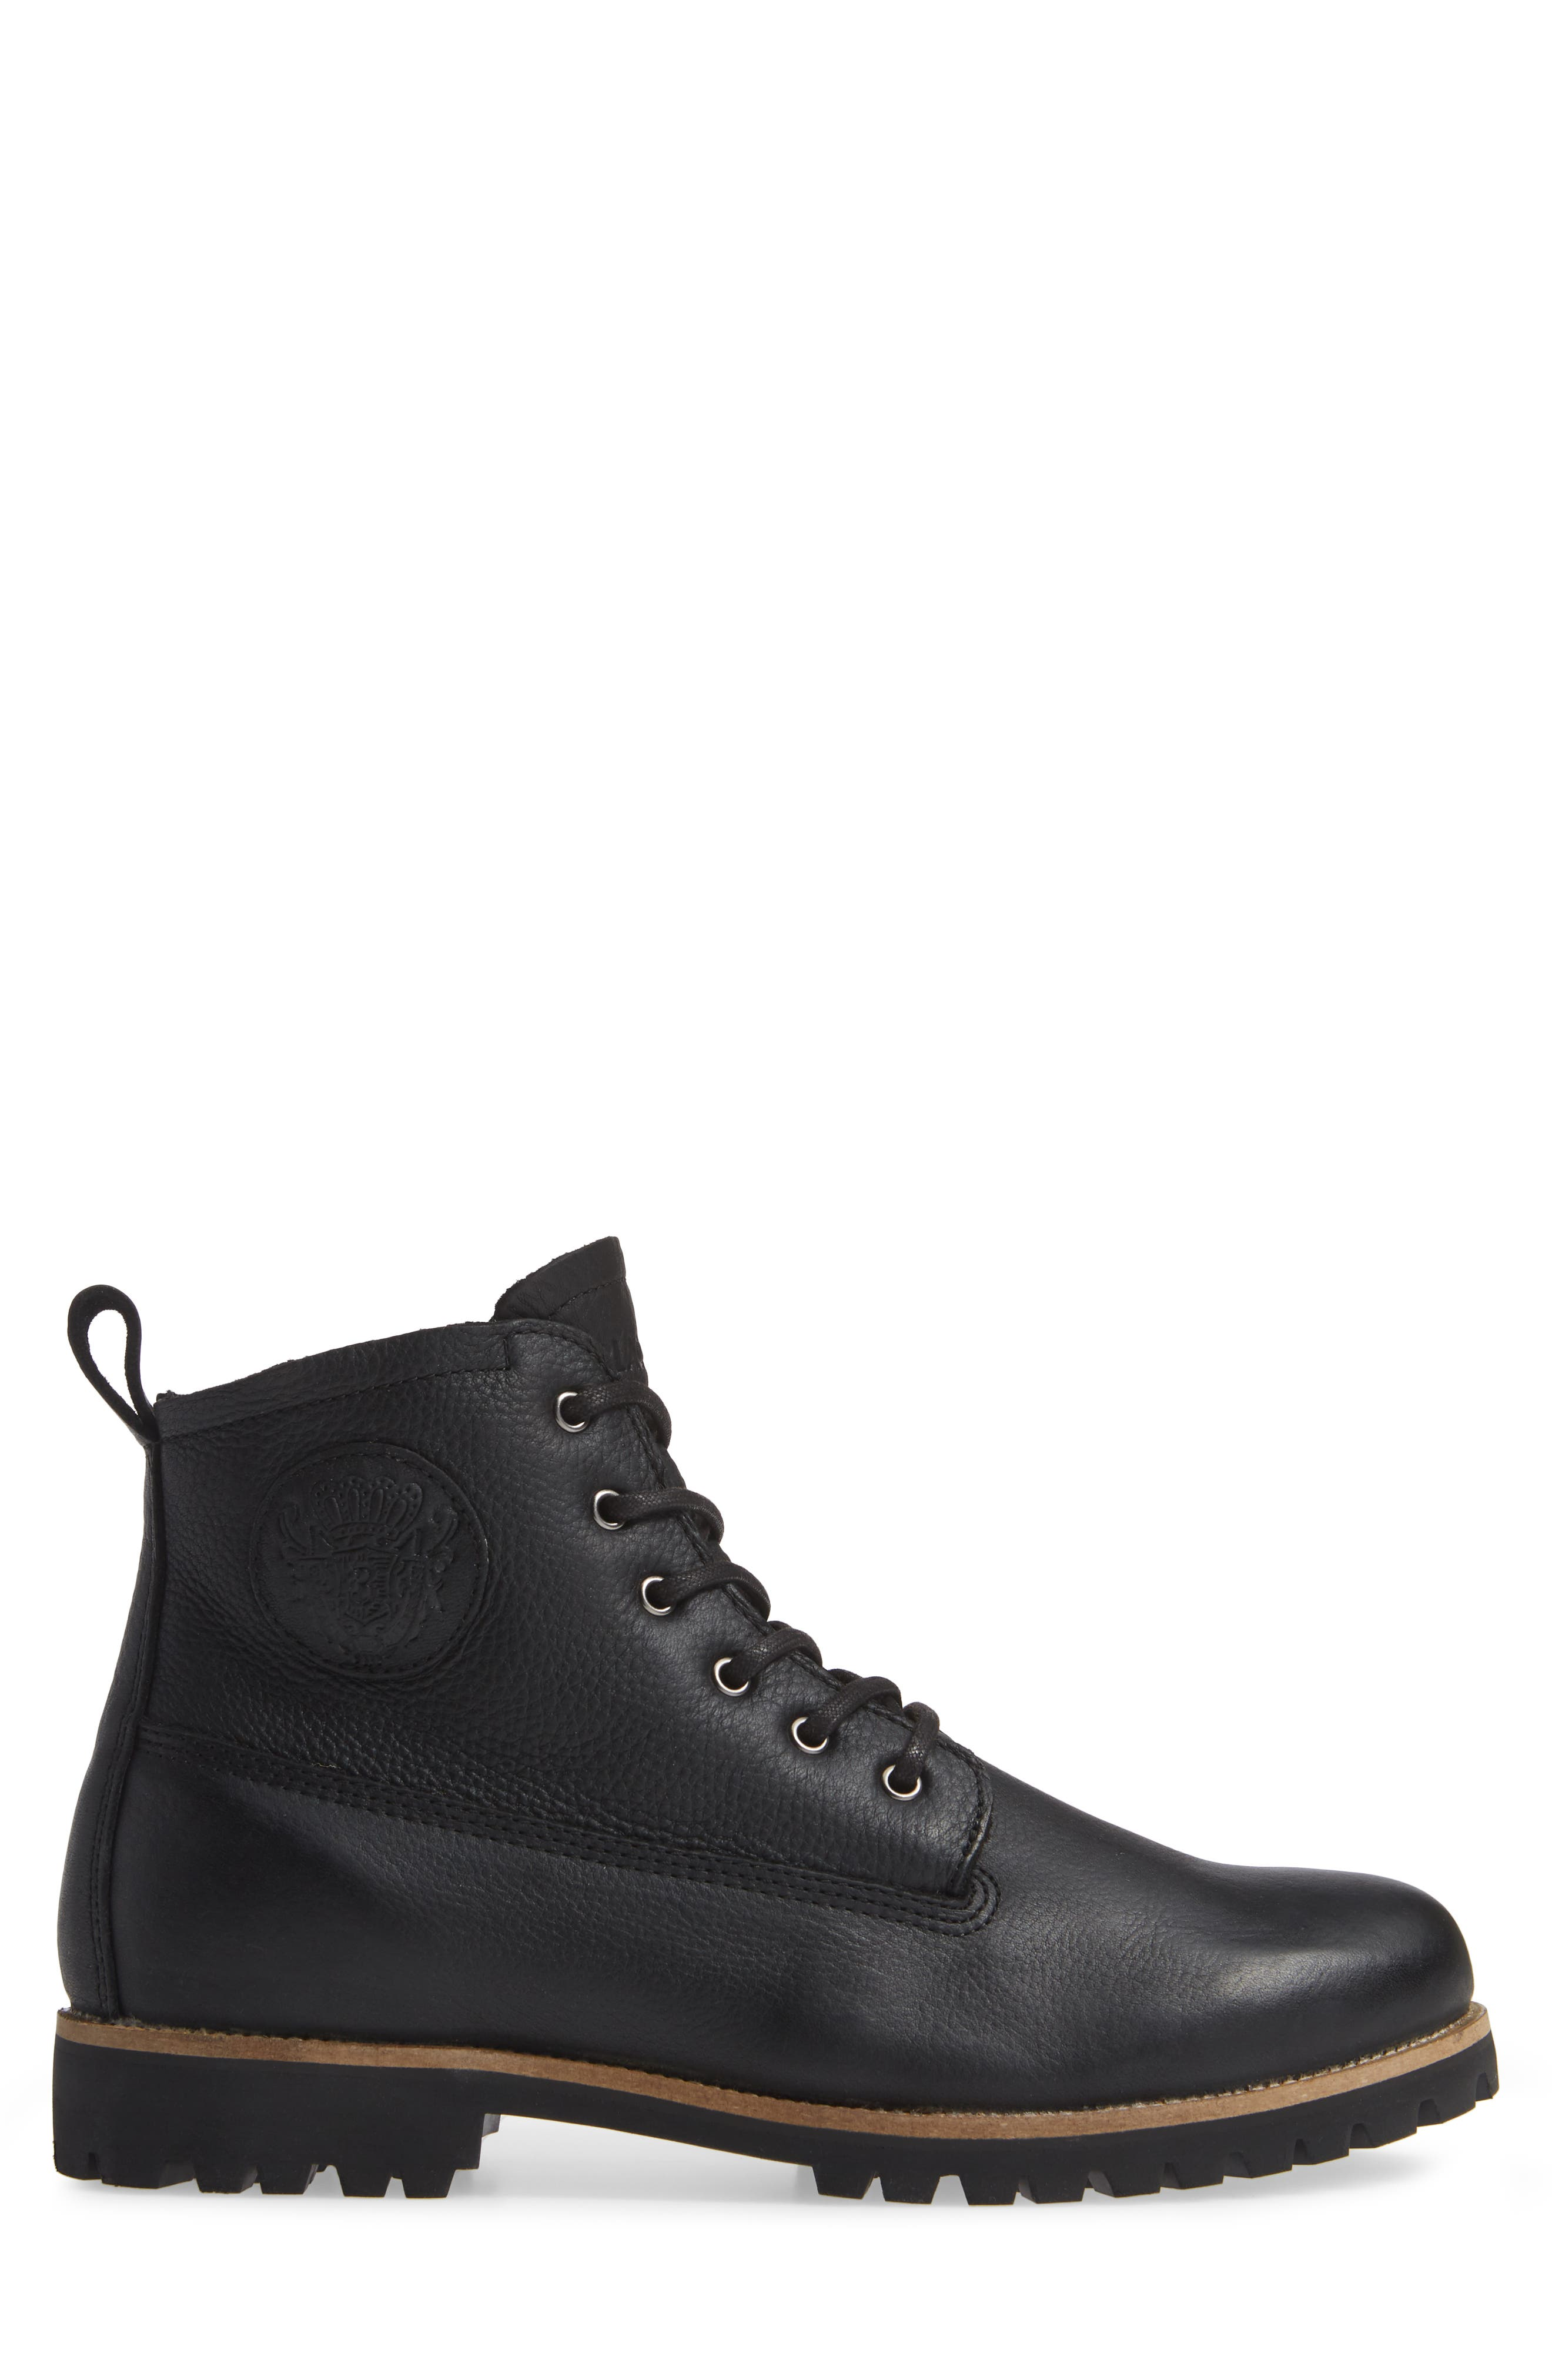 OM60 Waterproof Genuine Shearling Boot,                             Alternate thumbnail 3, color,                             BLACK